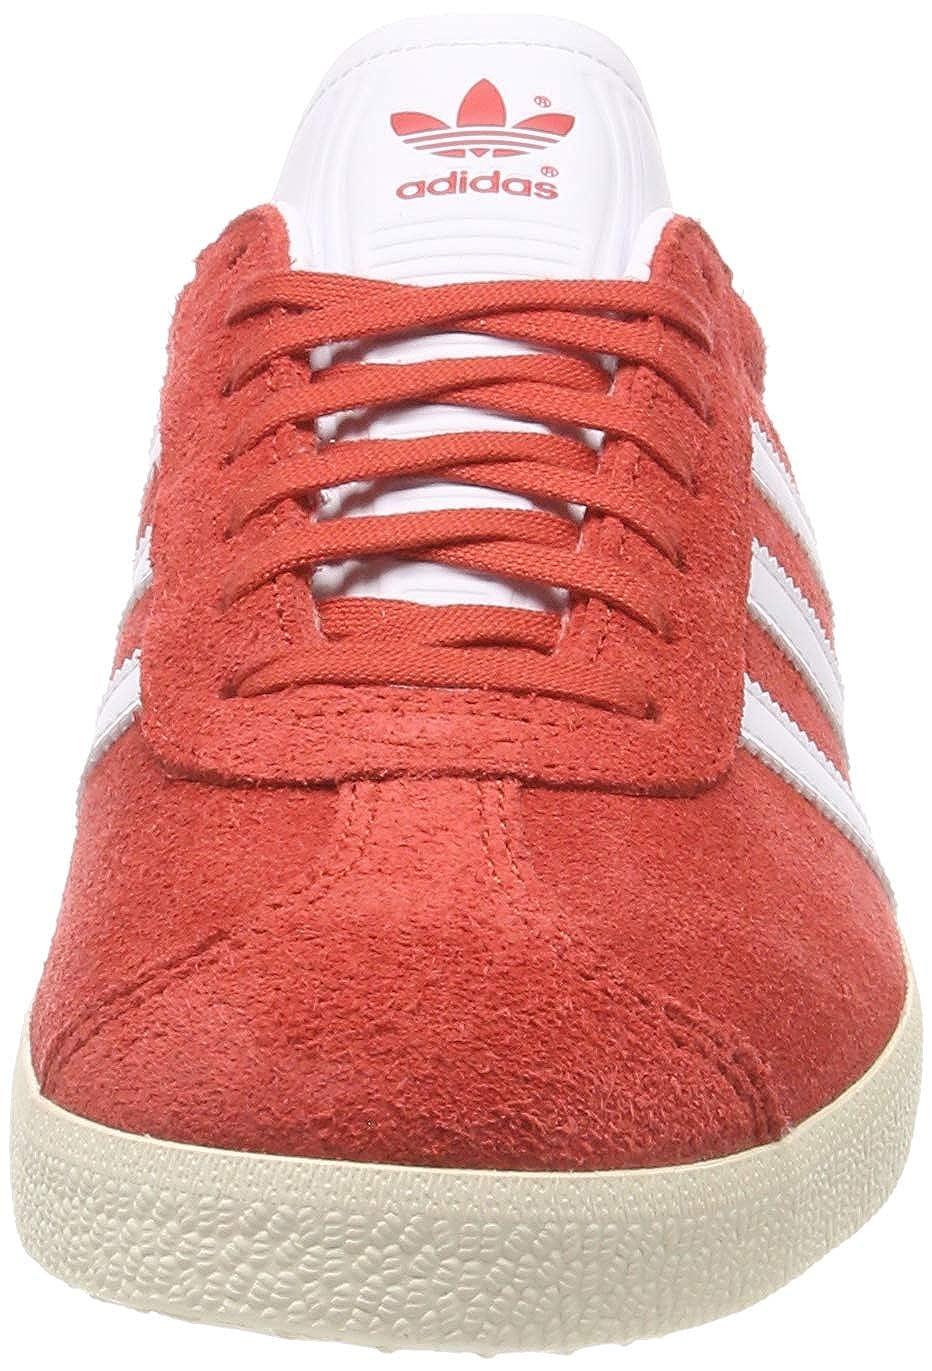 size 40 0e9e2 9ab4a adidas Gazelle, Scarpe da Fitness Bambino  Amazon.it  Scarpe e borse